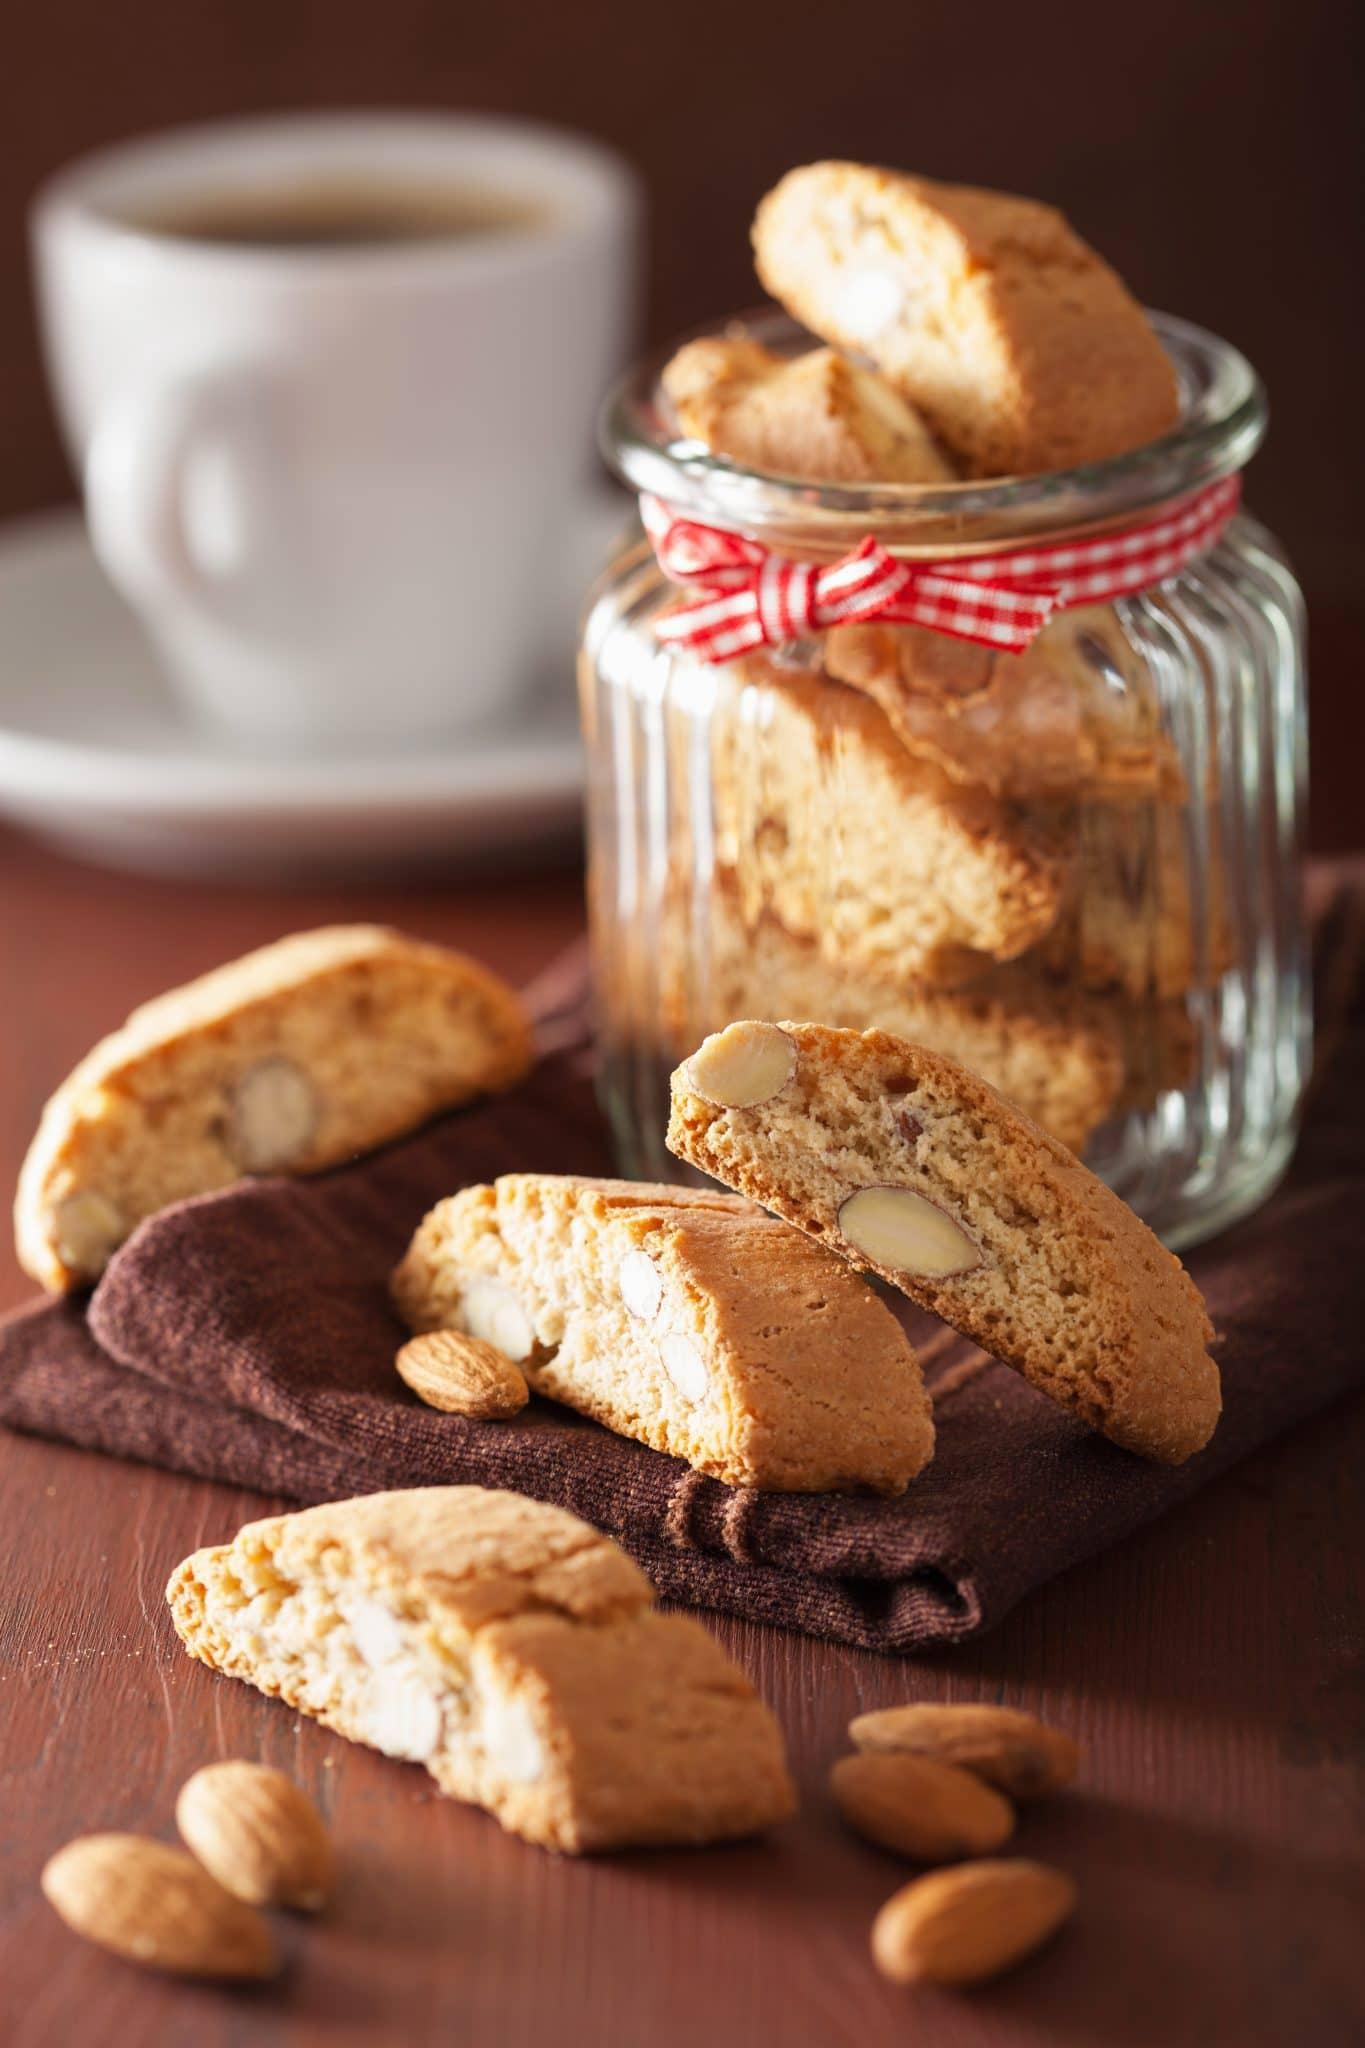 traditional-italian-cantuccini-cookies-in-glass-PHJ24YZ